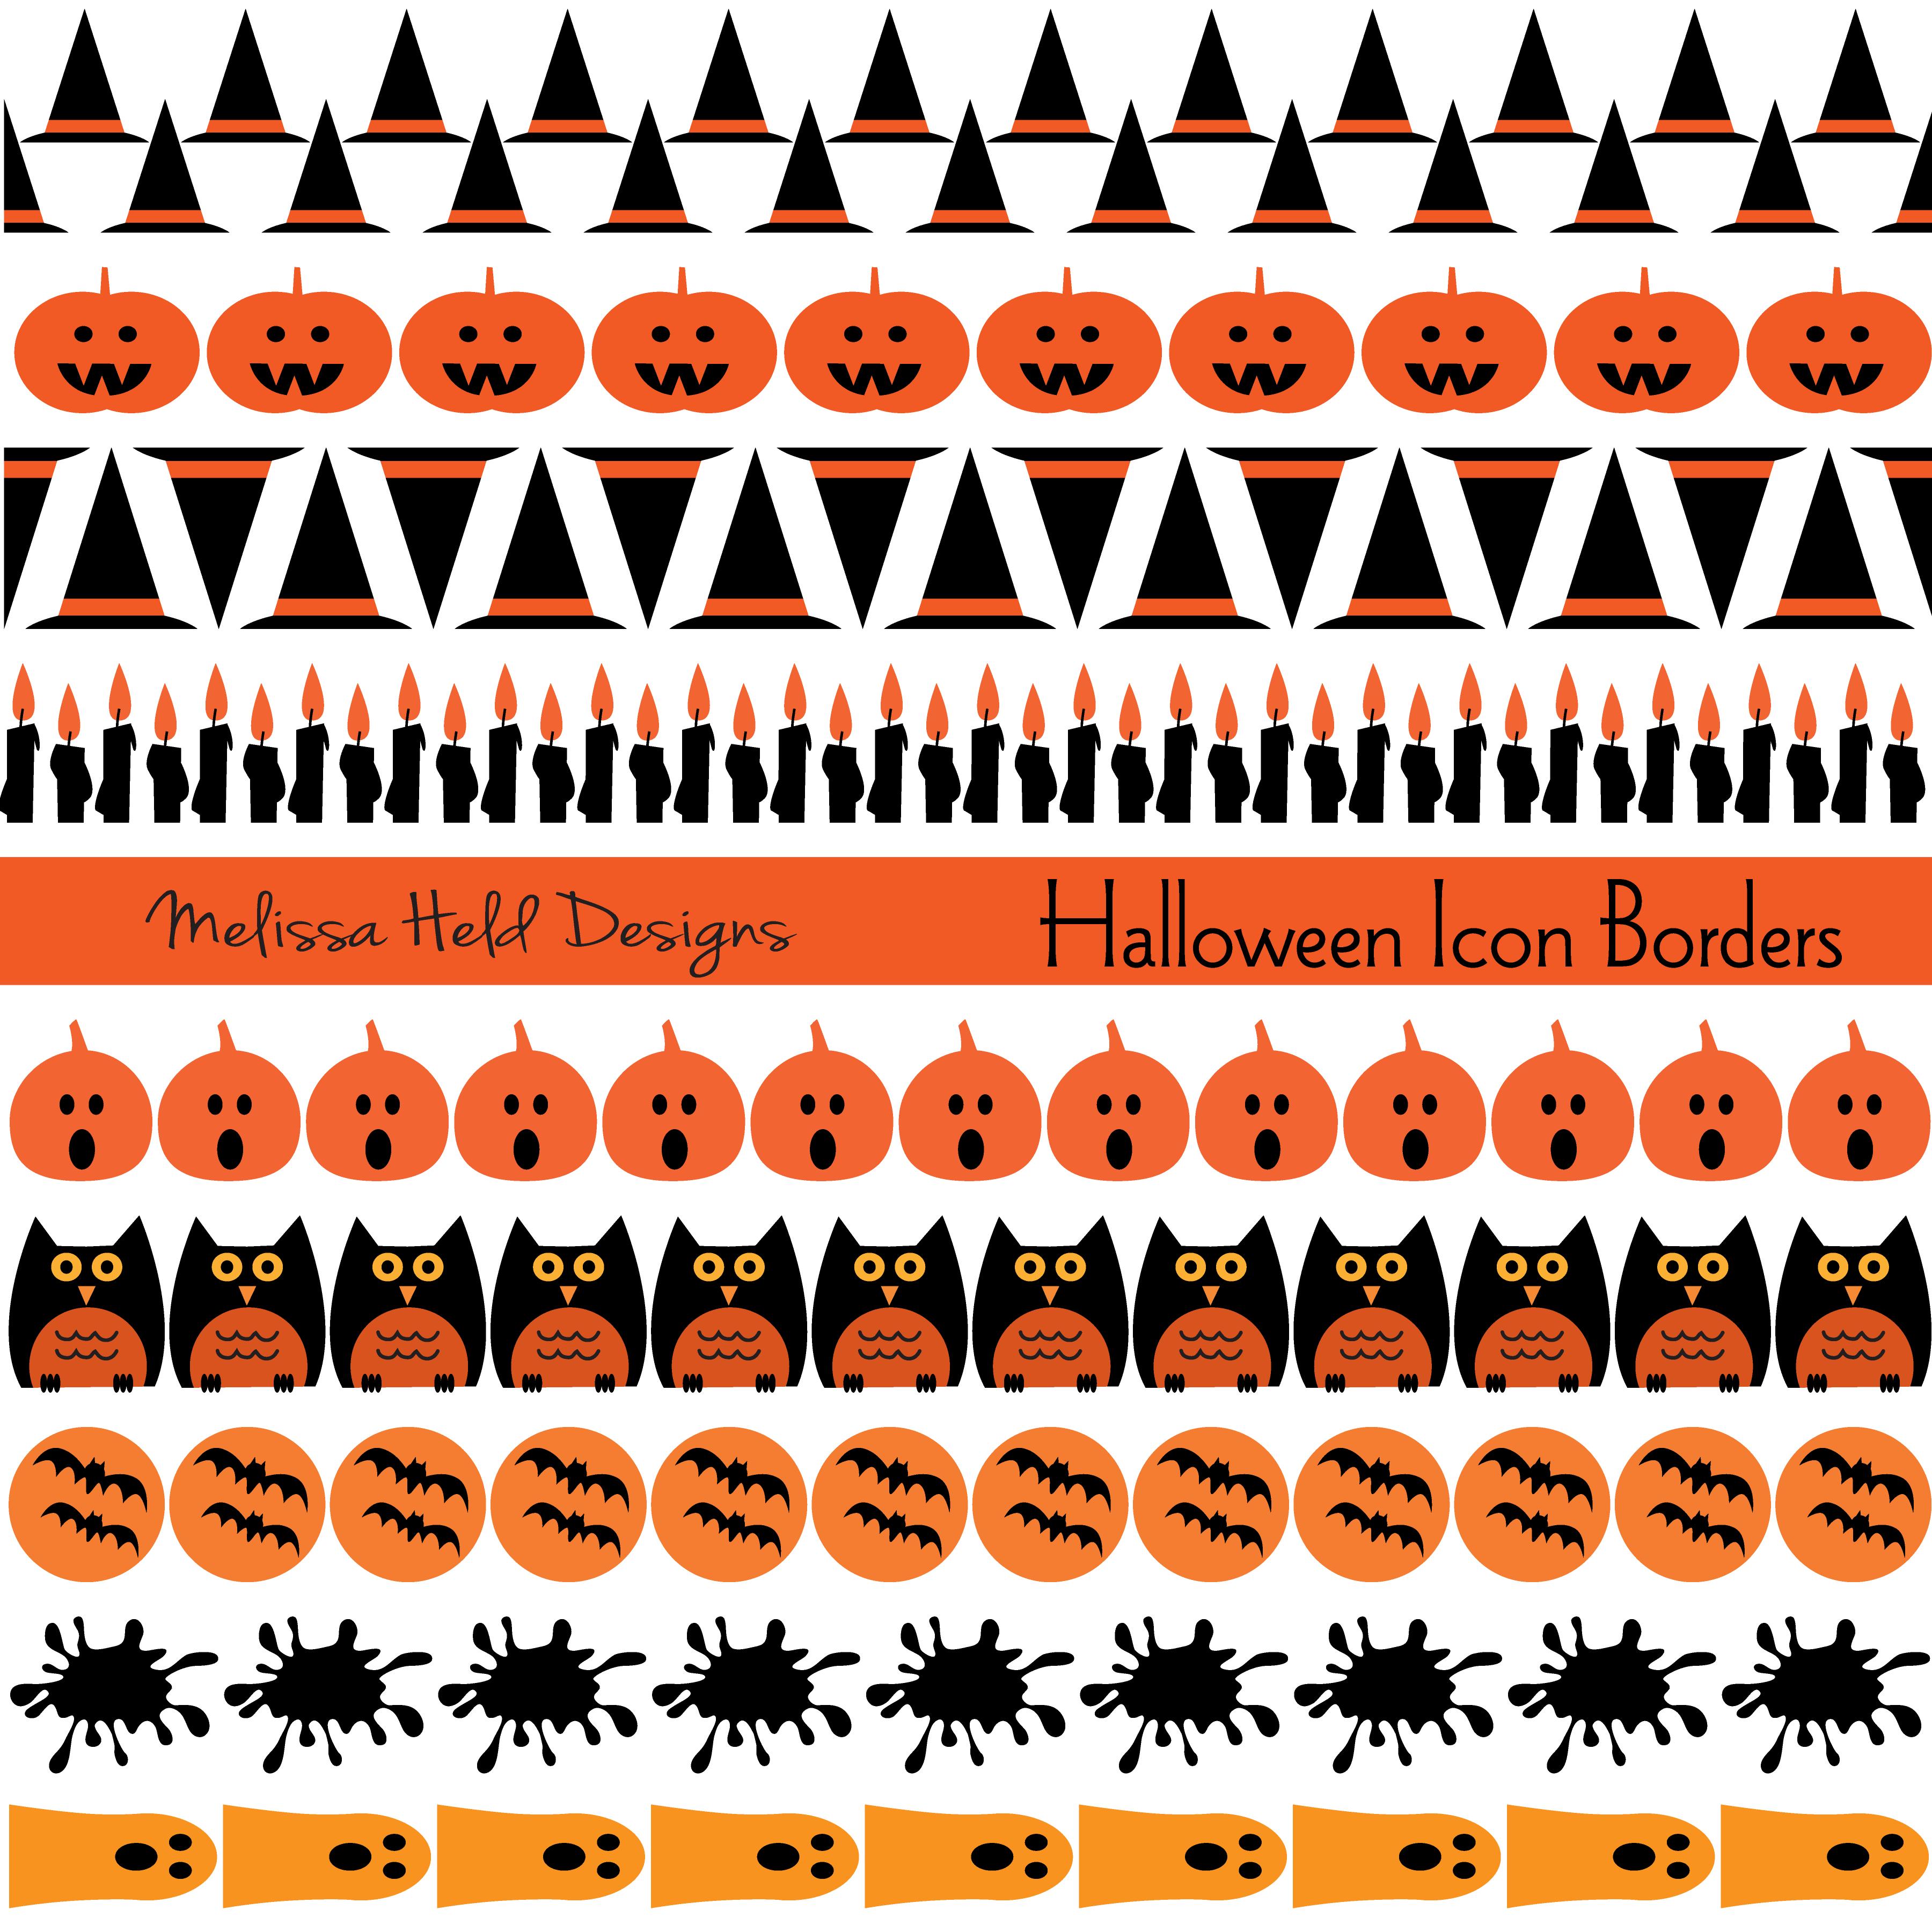 Halloween Icon Borders